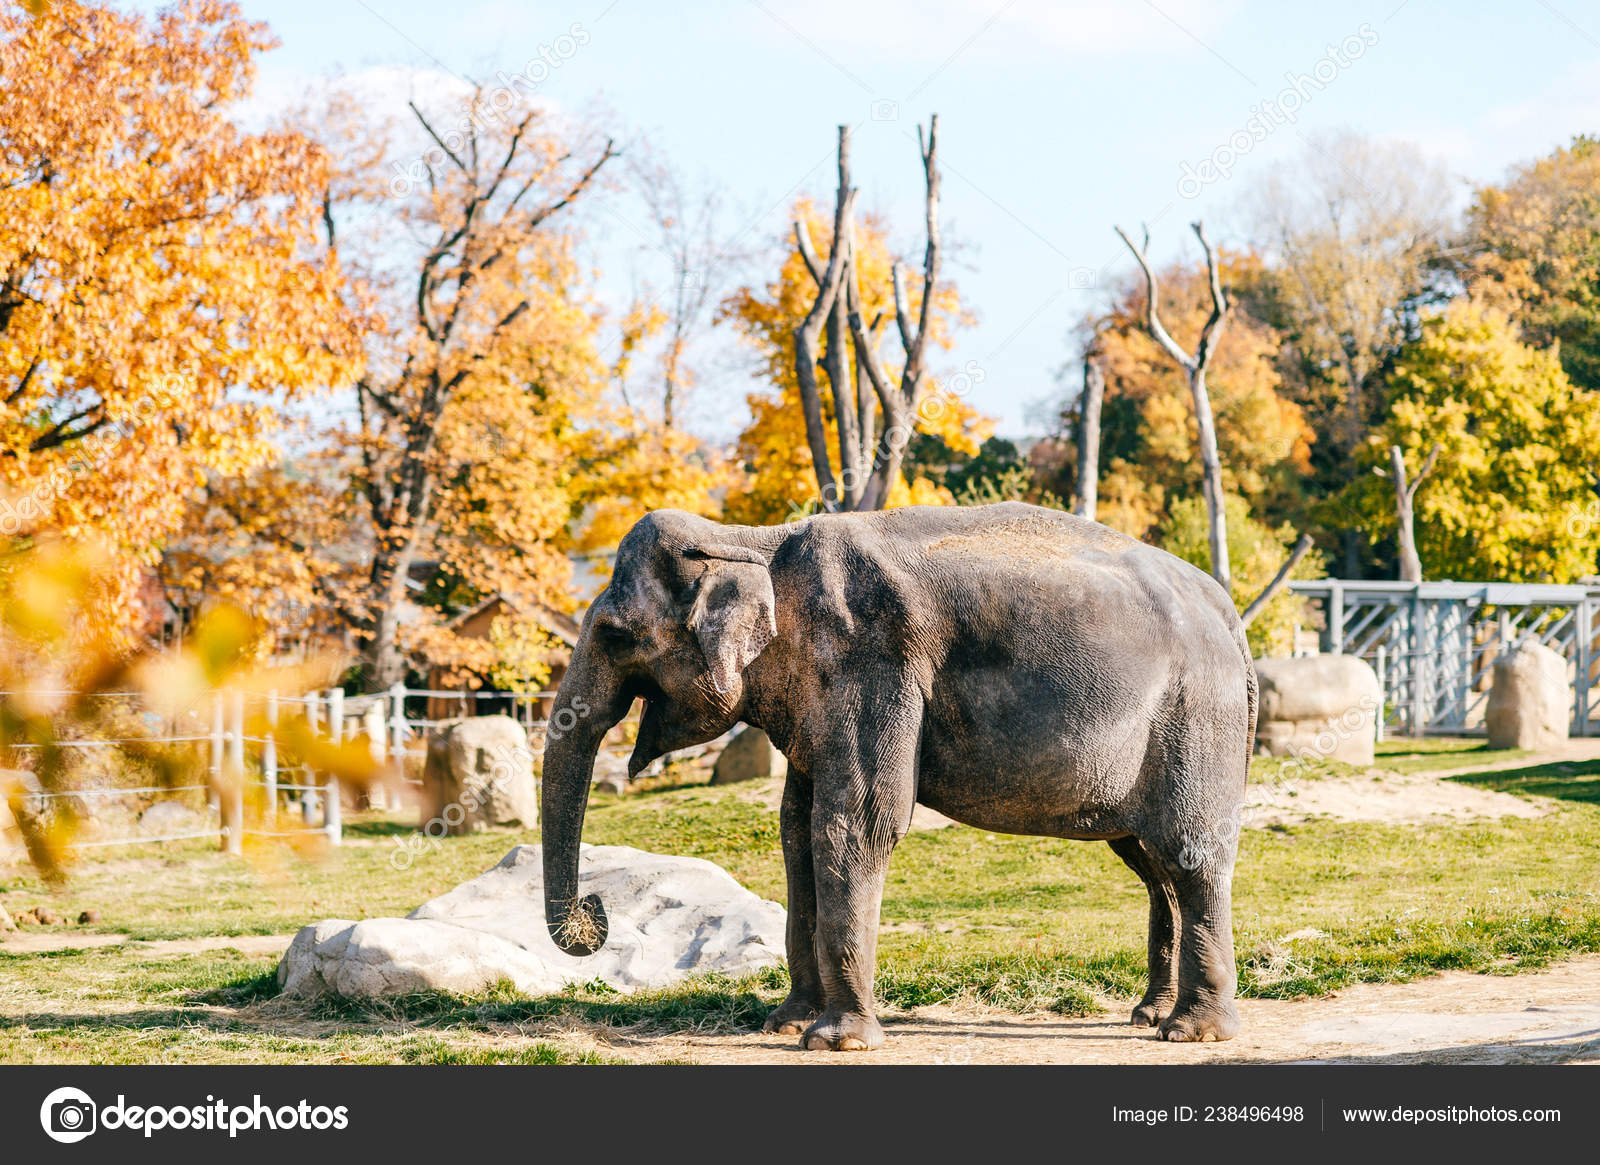 Elephant Natural Habitat Africain Autumn Southern Safari Park Stock Photo C Hplovecraft Mail Ru 238496498